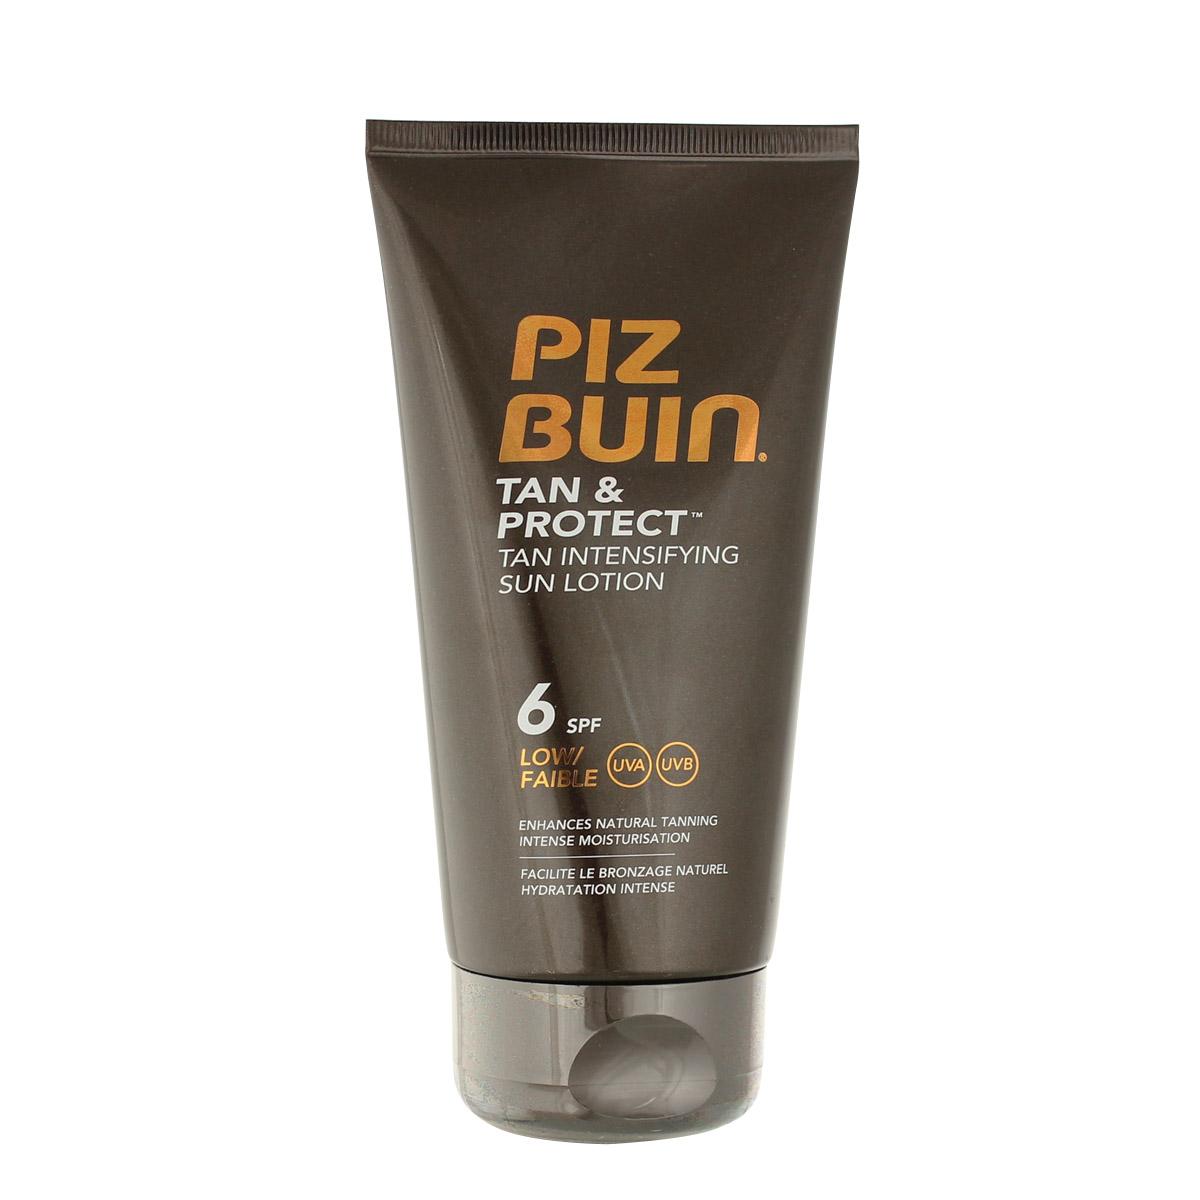 PizBuin Tan & Protect Tan Intensifying Sun Lotion SPF 6 150 ml